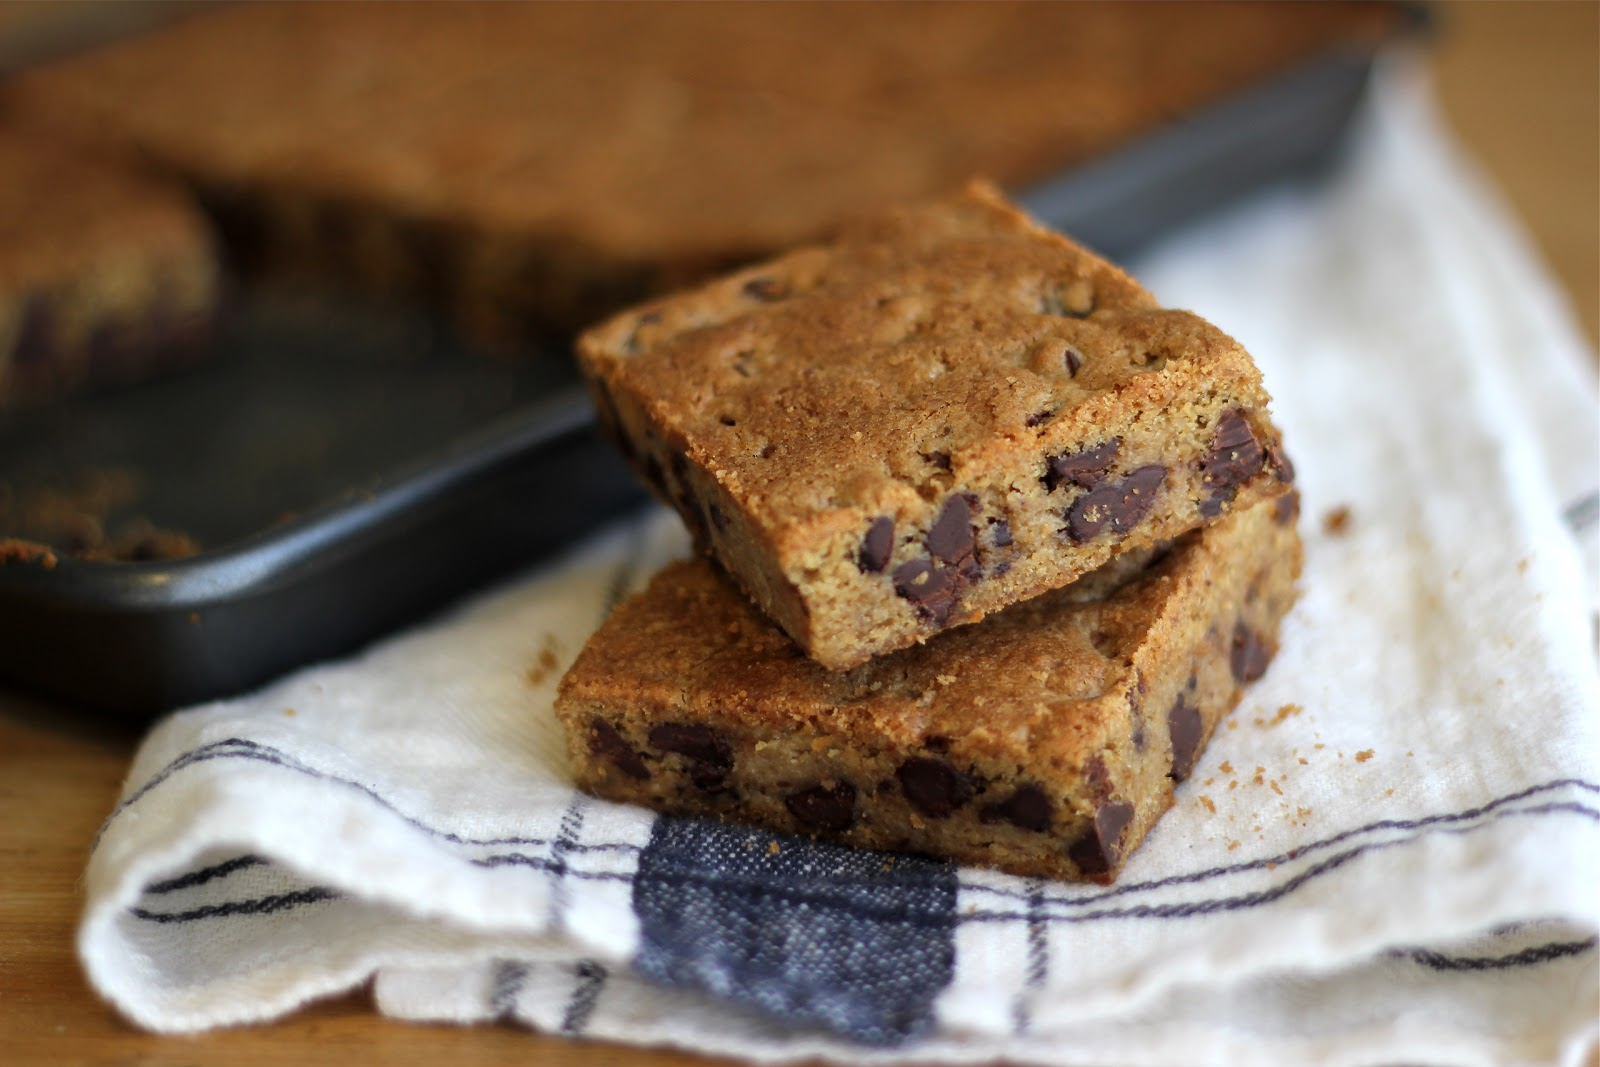 Barefoot Contessa Cookies Chocolate Chunk Recipe